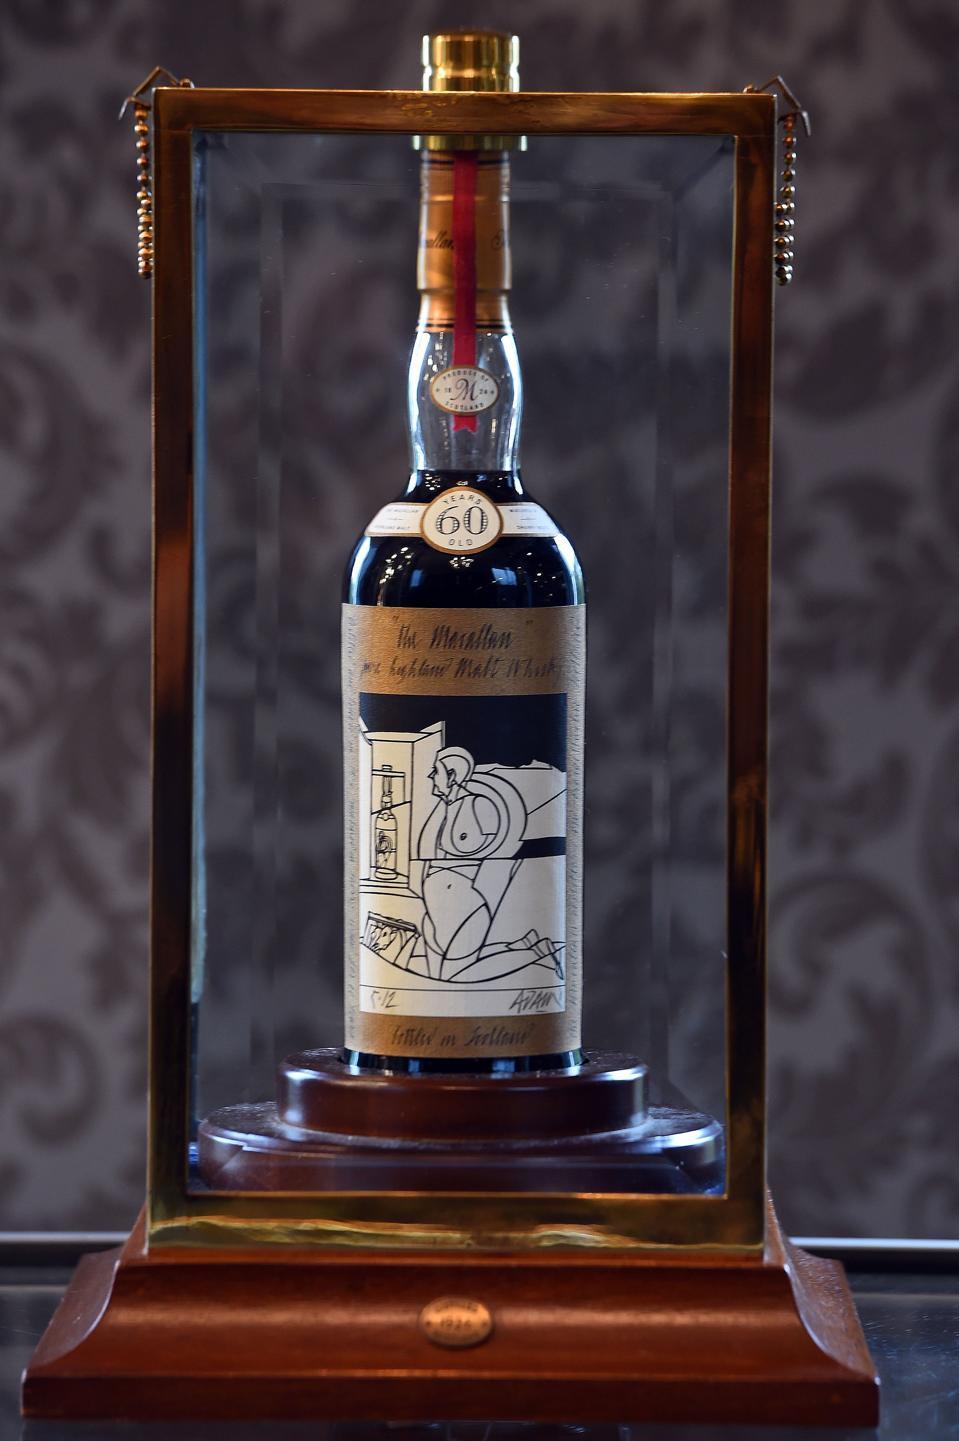 Liquor cover image